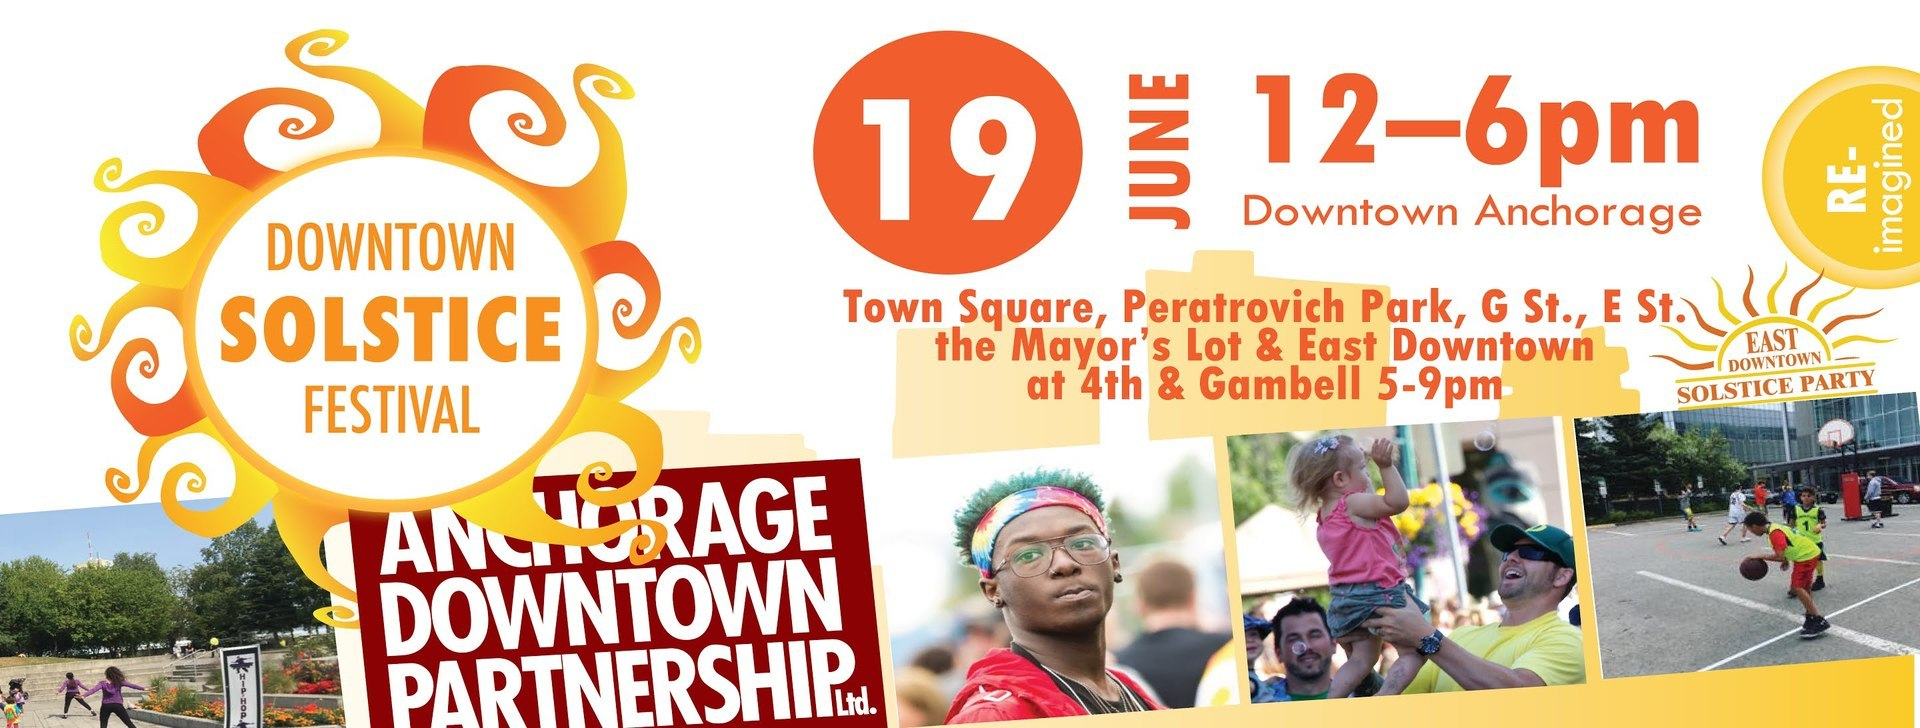 Downtown Solstice Festival